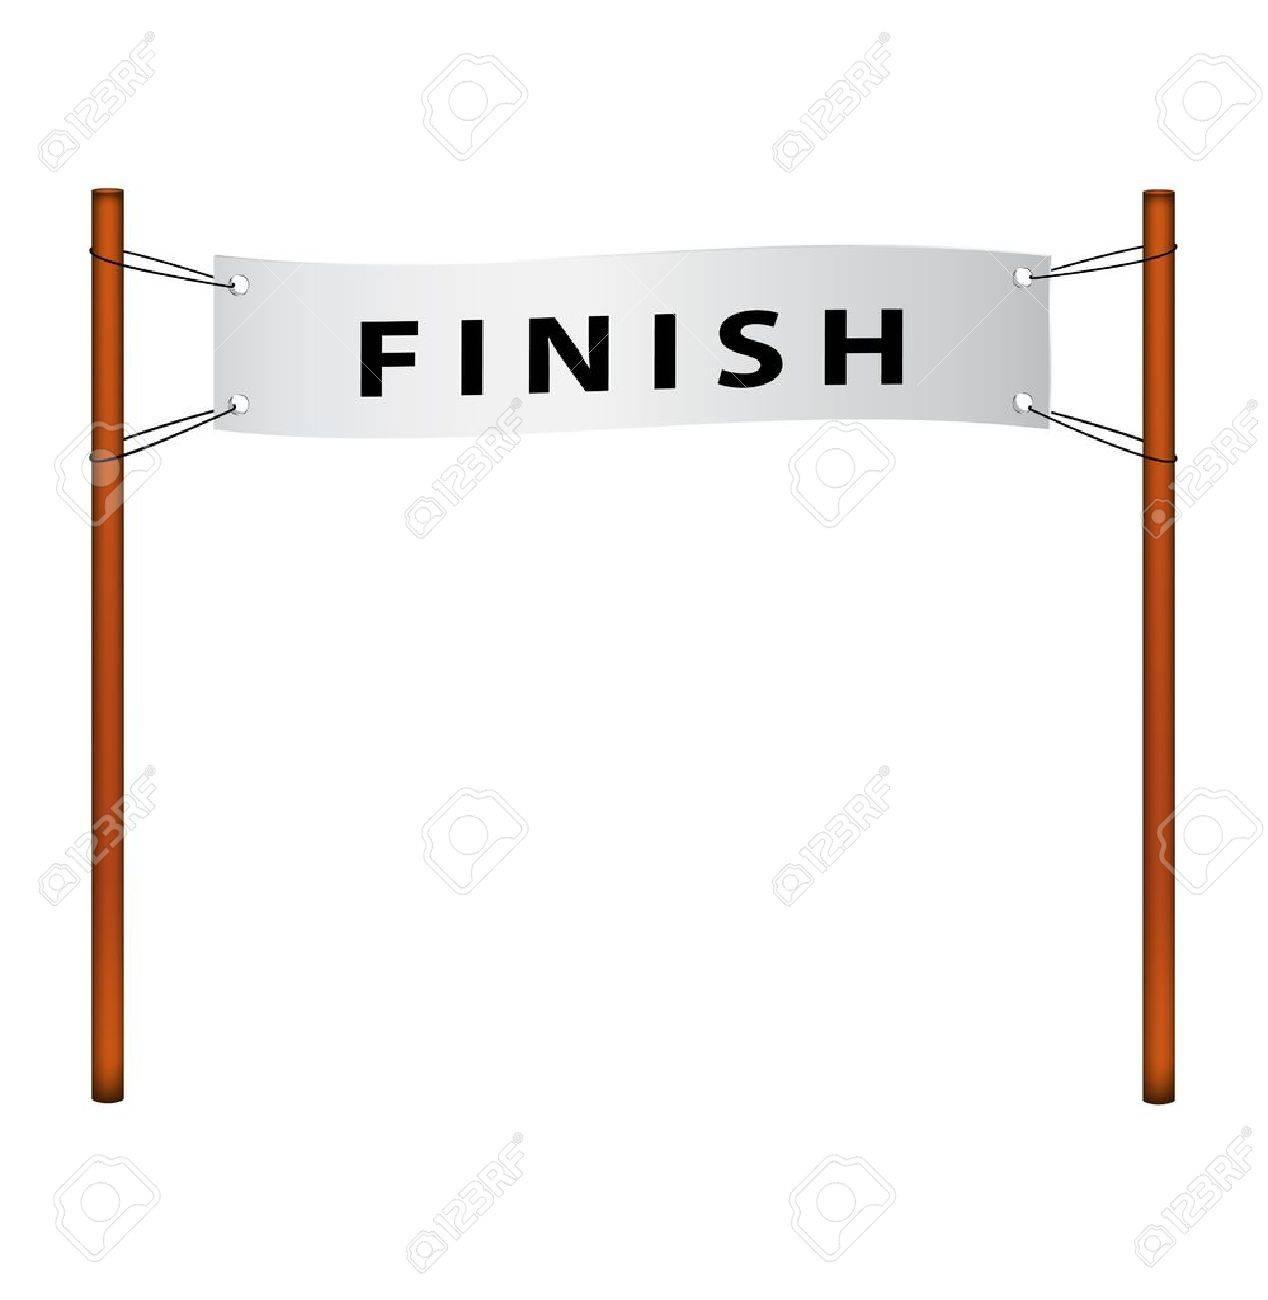 Finish line ribbon with finish.